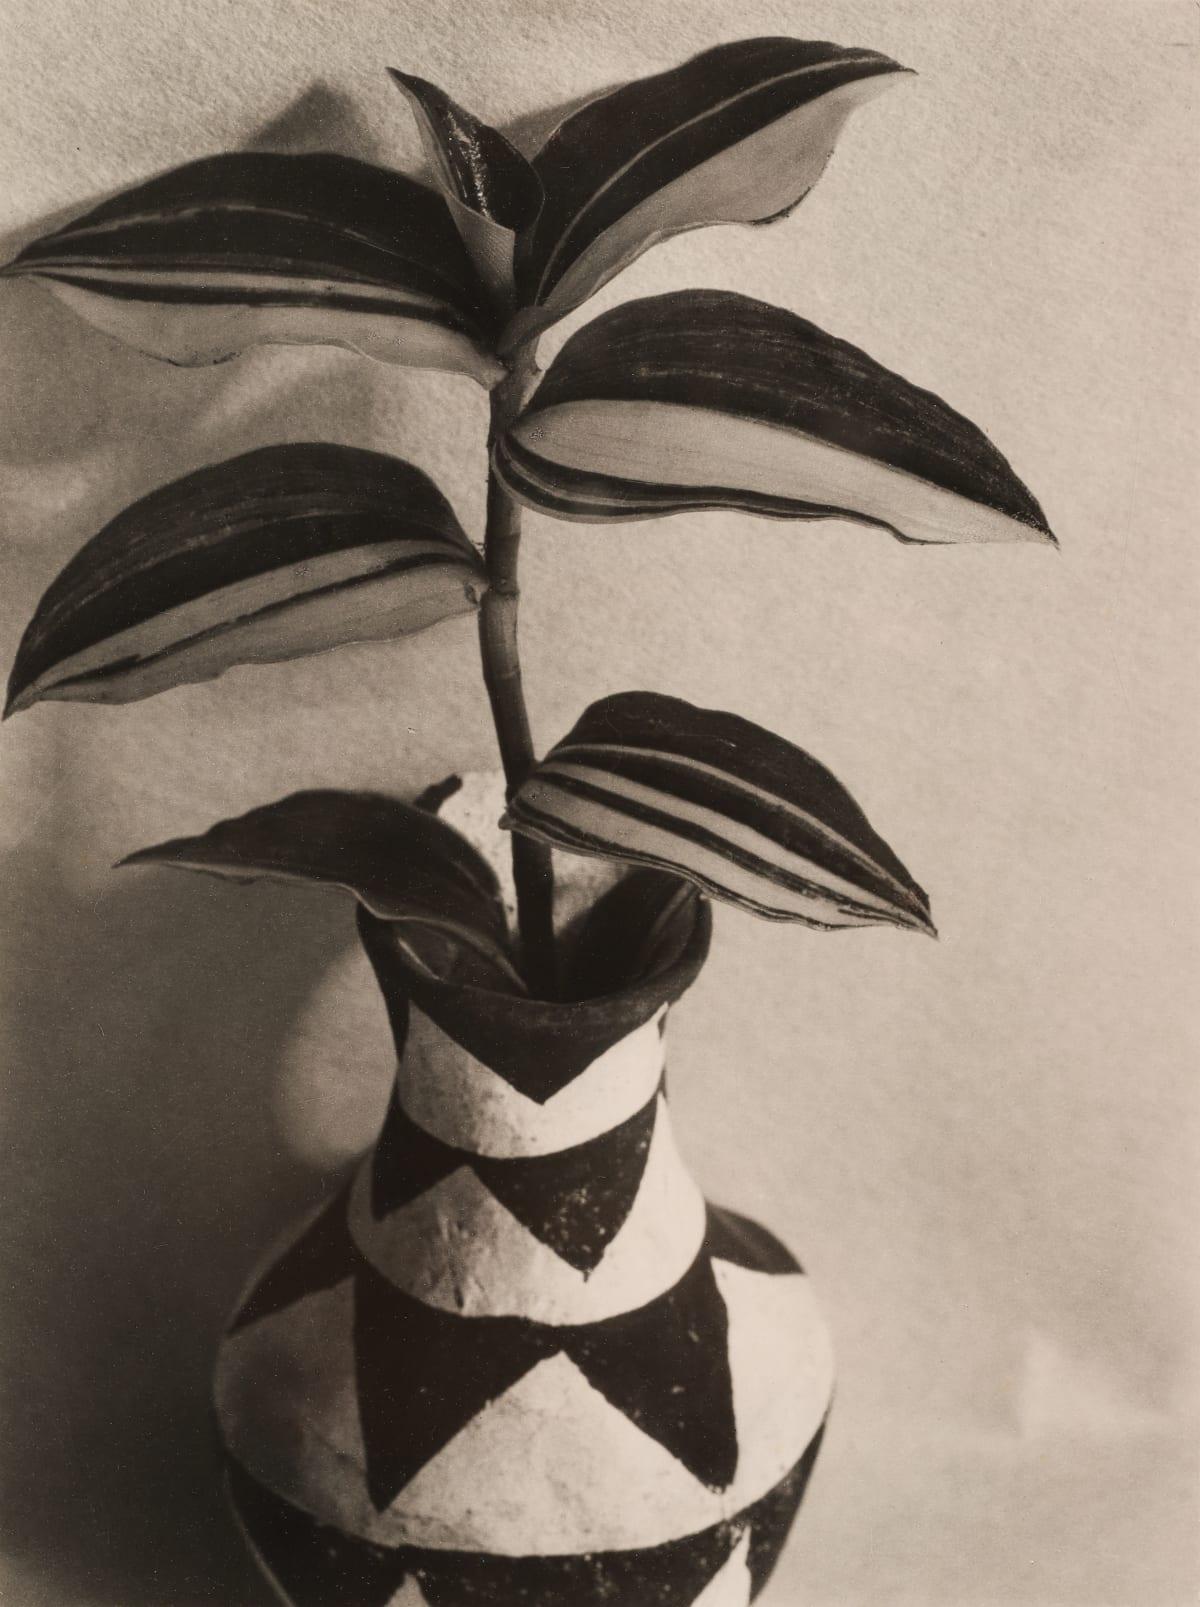 Imogen Cunningham, Wandering Jew, 1920